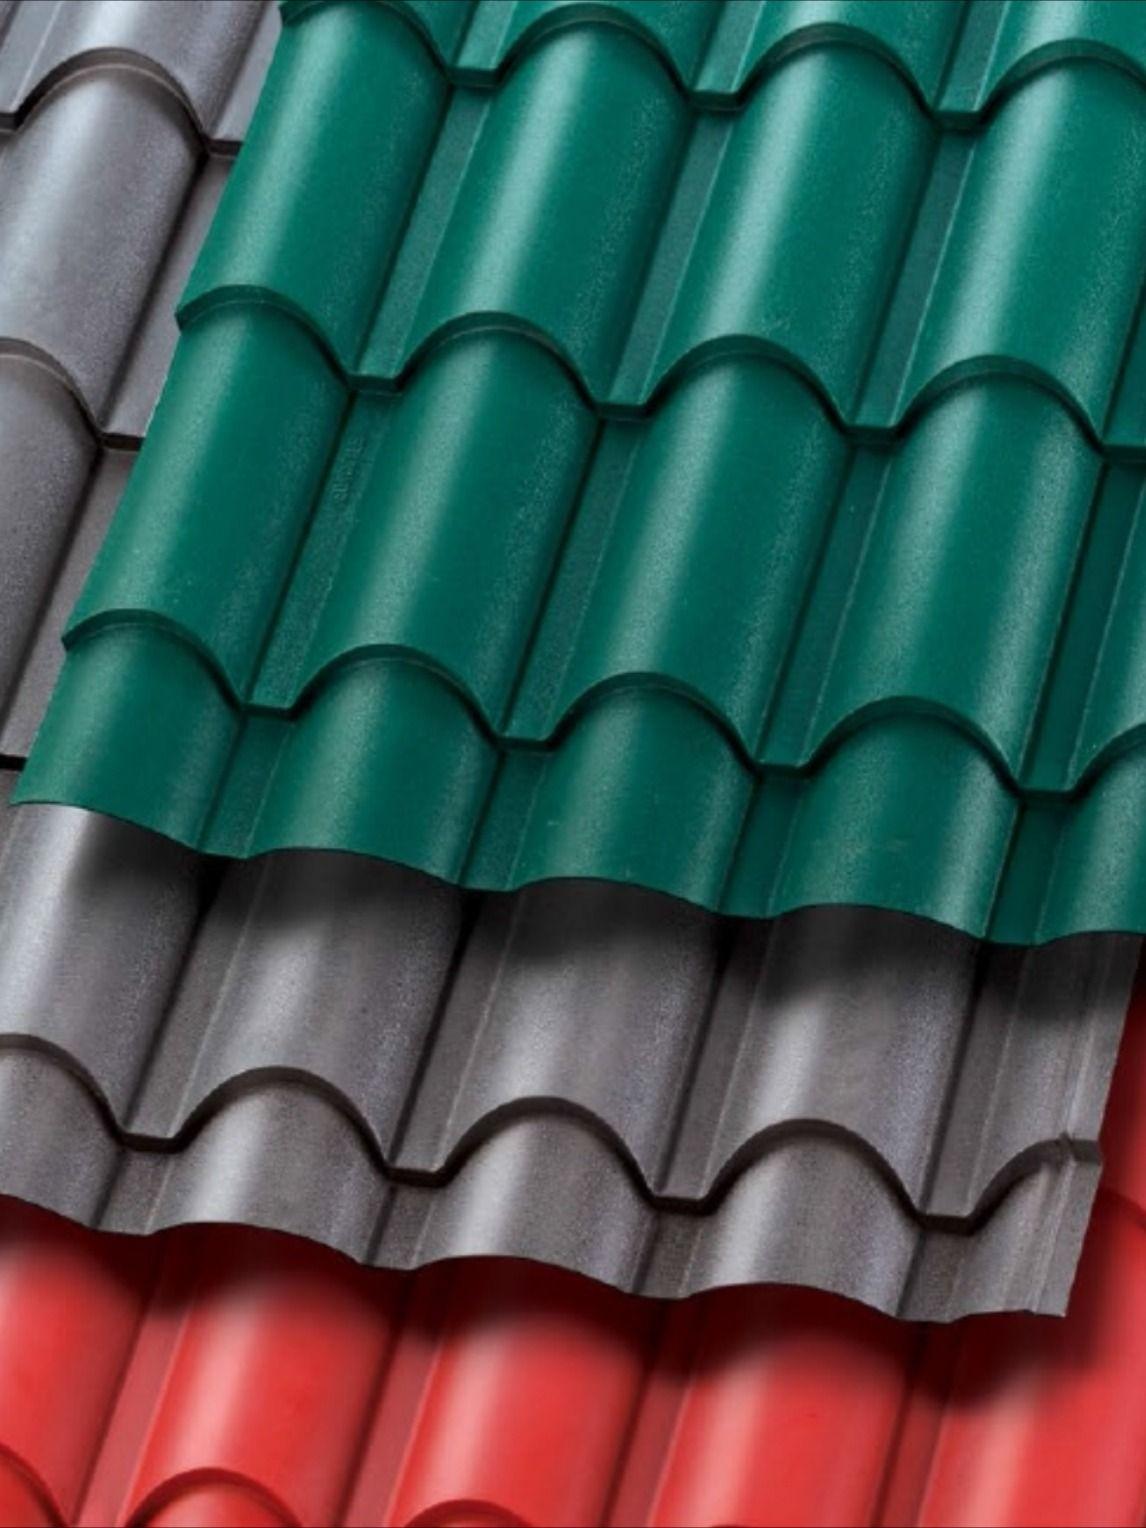 Premium Quality Alu Zinc Roofing Sheets Kerala Oriental Peb In 2020 Zinc Roof Roofing Sheets Clay Roof Tiles